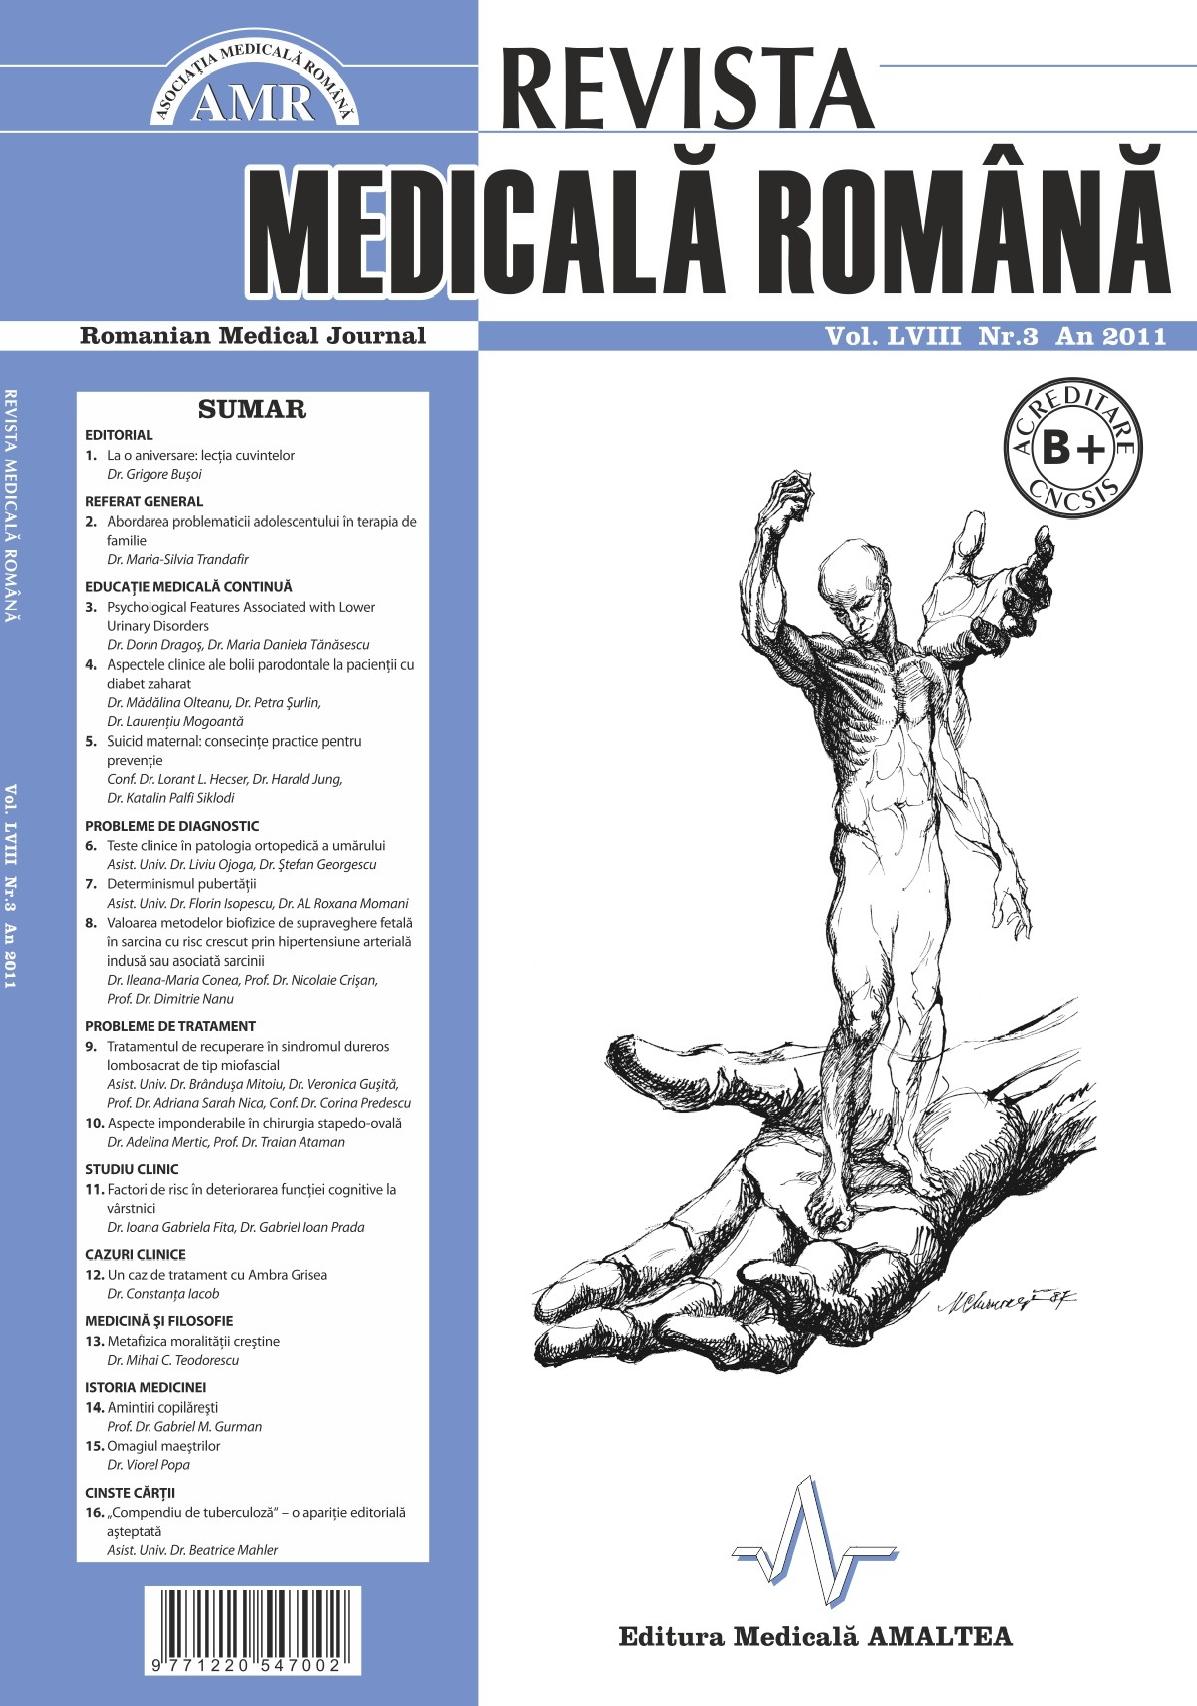 REVISTA MEDICALA ROMANA - Romanian Medical Journal, Vol. LVIII, Nr. 3, An 2011